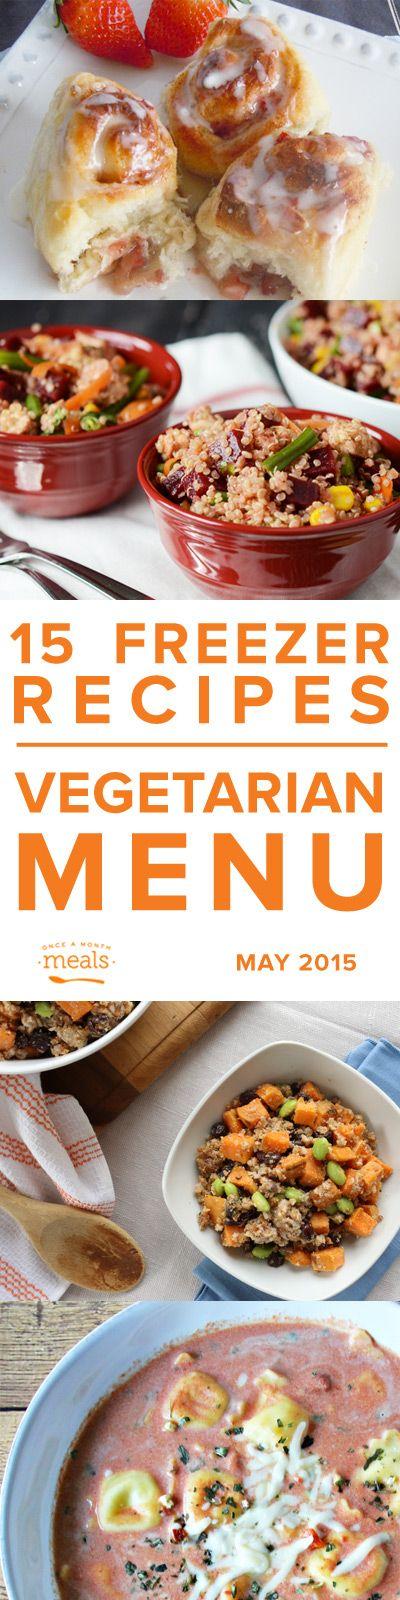 Vegetarian May 2015 | Once a Month Meals | Freezer Cooking | Freezer Meals | Custom Menus | Menu Planning